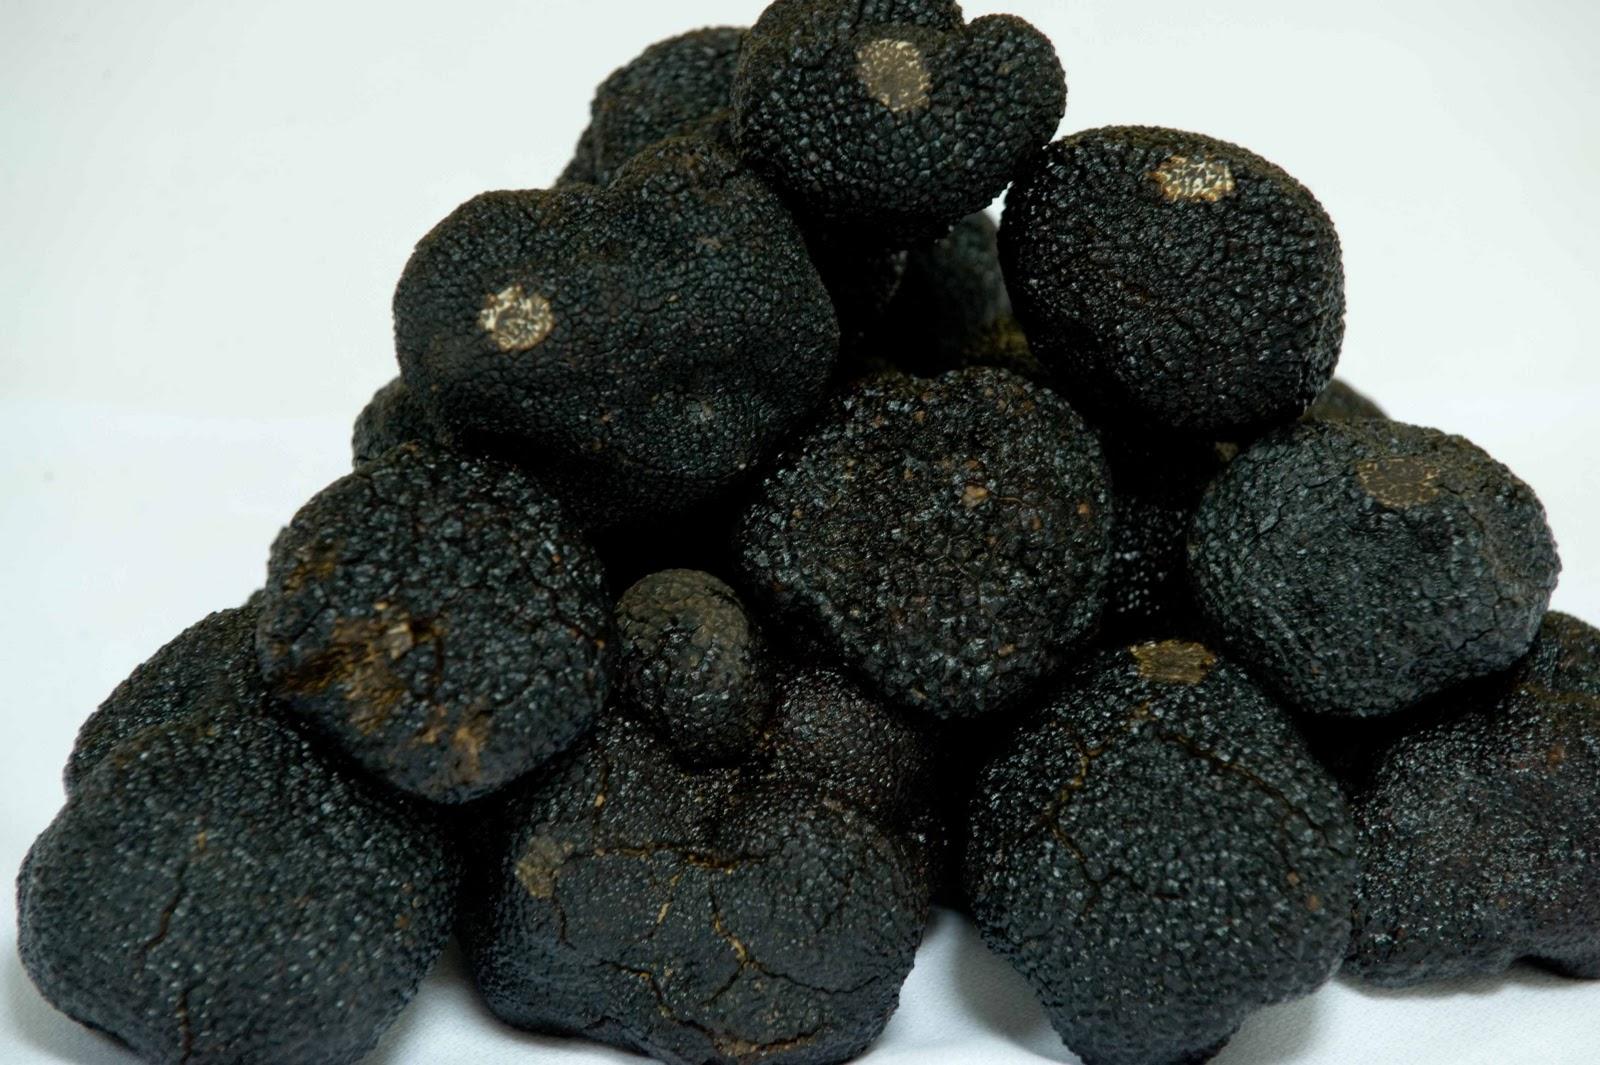 Tuber Melanosporum Black Truffles By Manjares De La Tierra   Truffes  Tr U00dcffles  Trufas  Tartufi